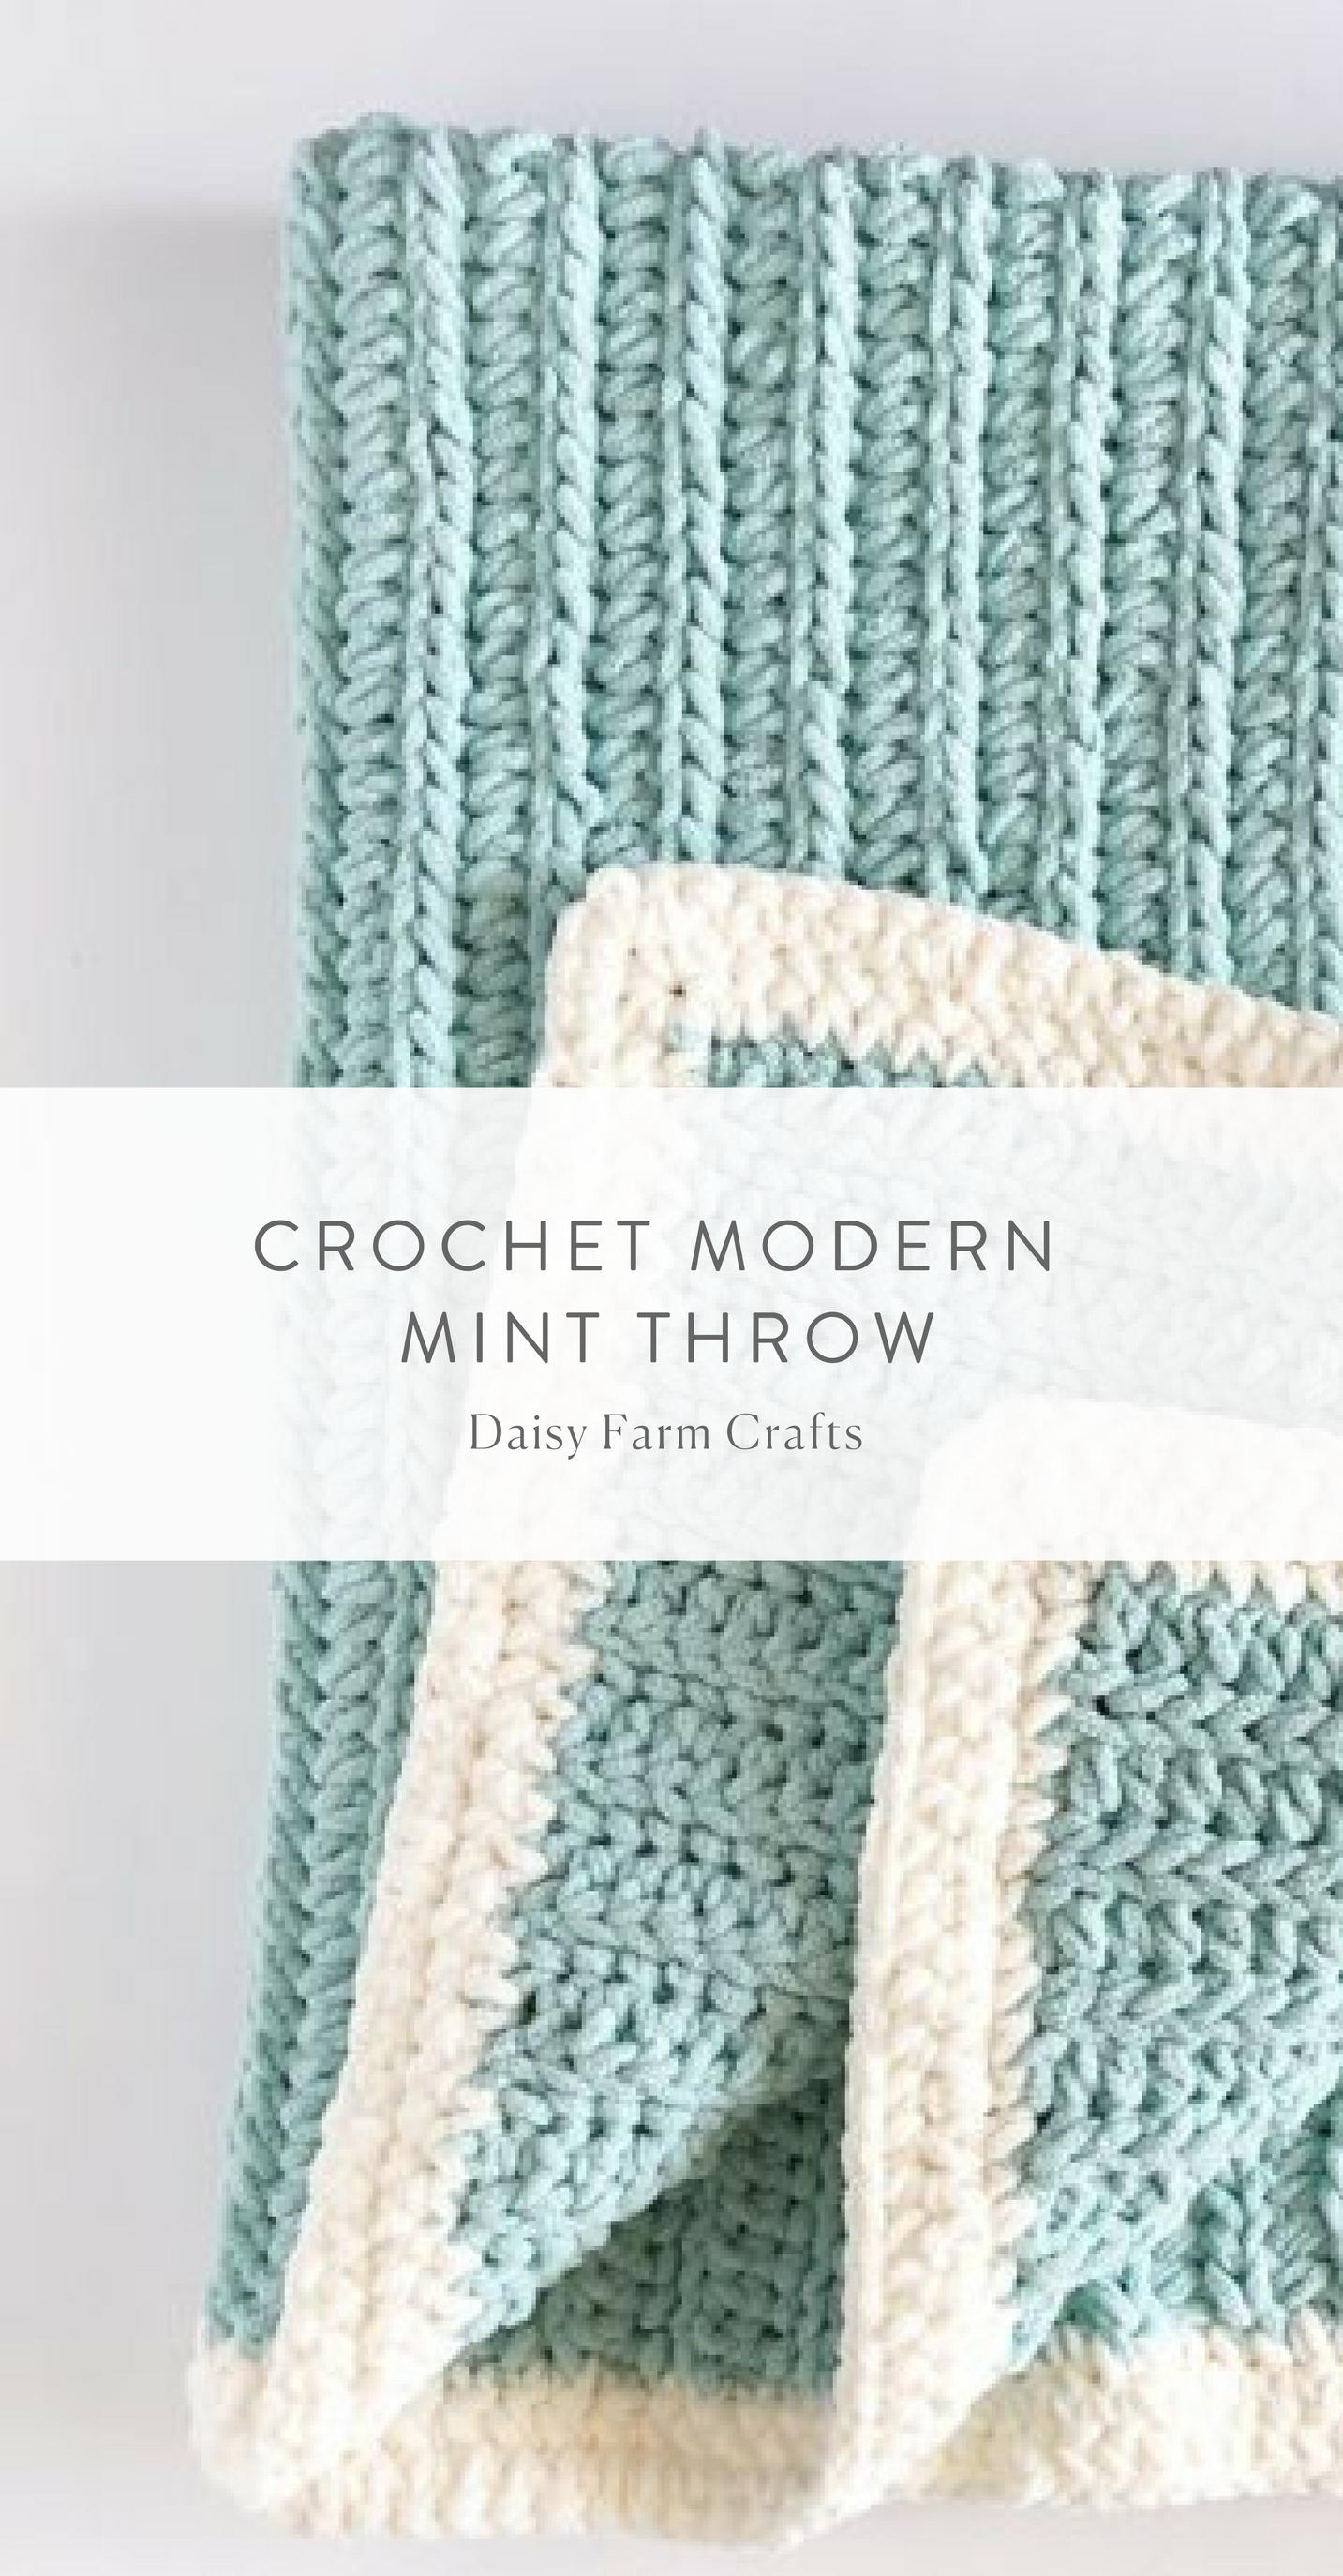 Free Pattern - Crochet Modern Mint Throw | For Mom | Pinterest ...